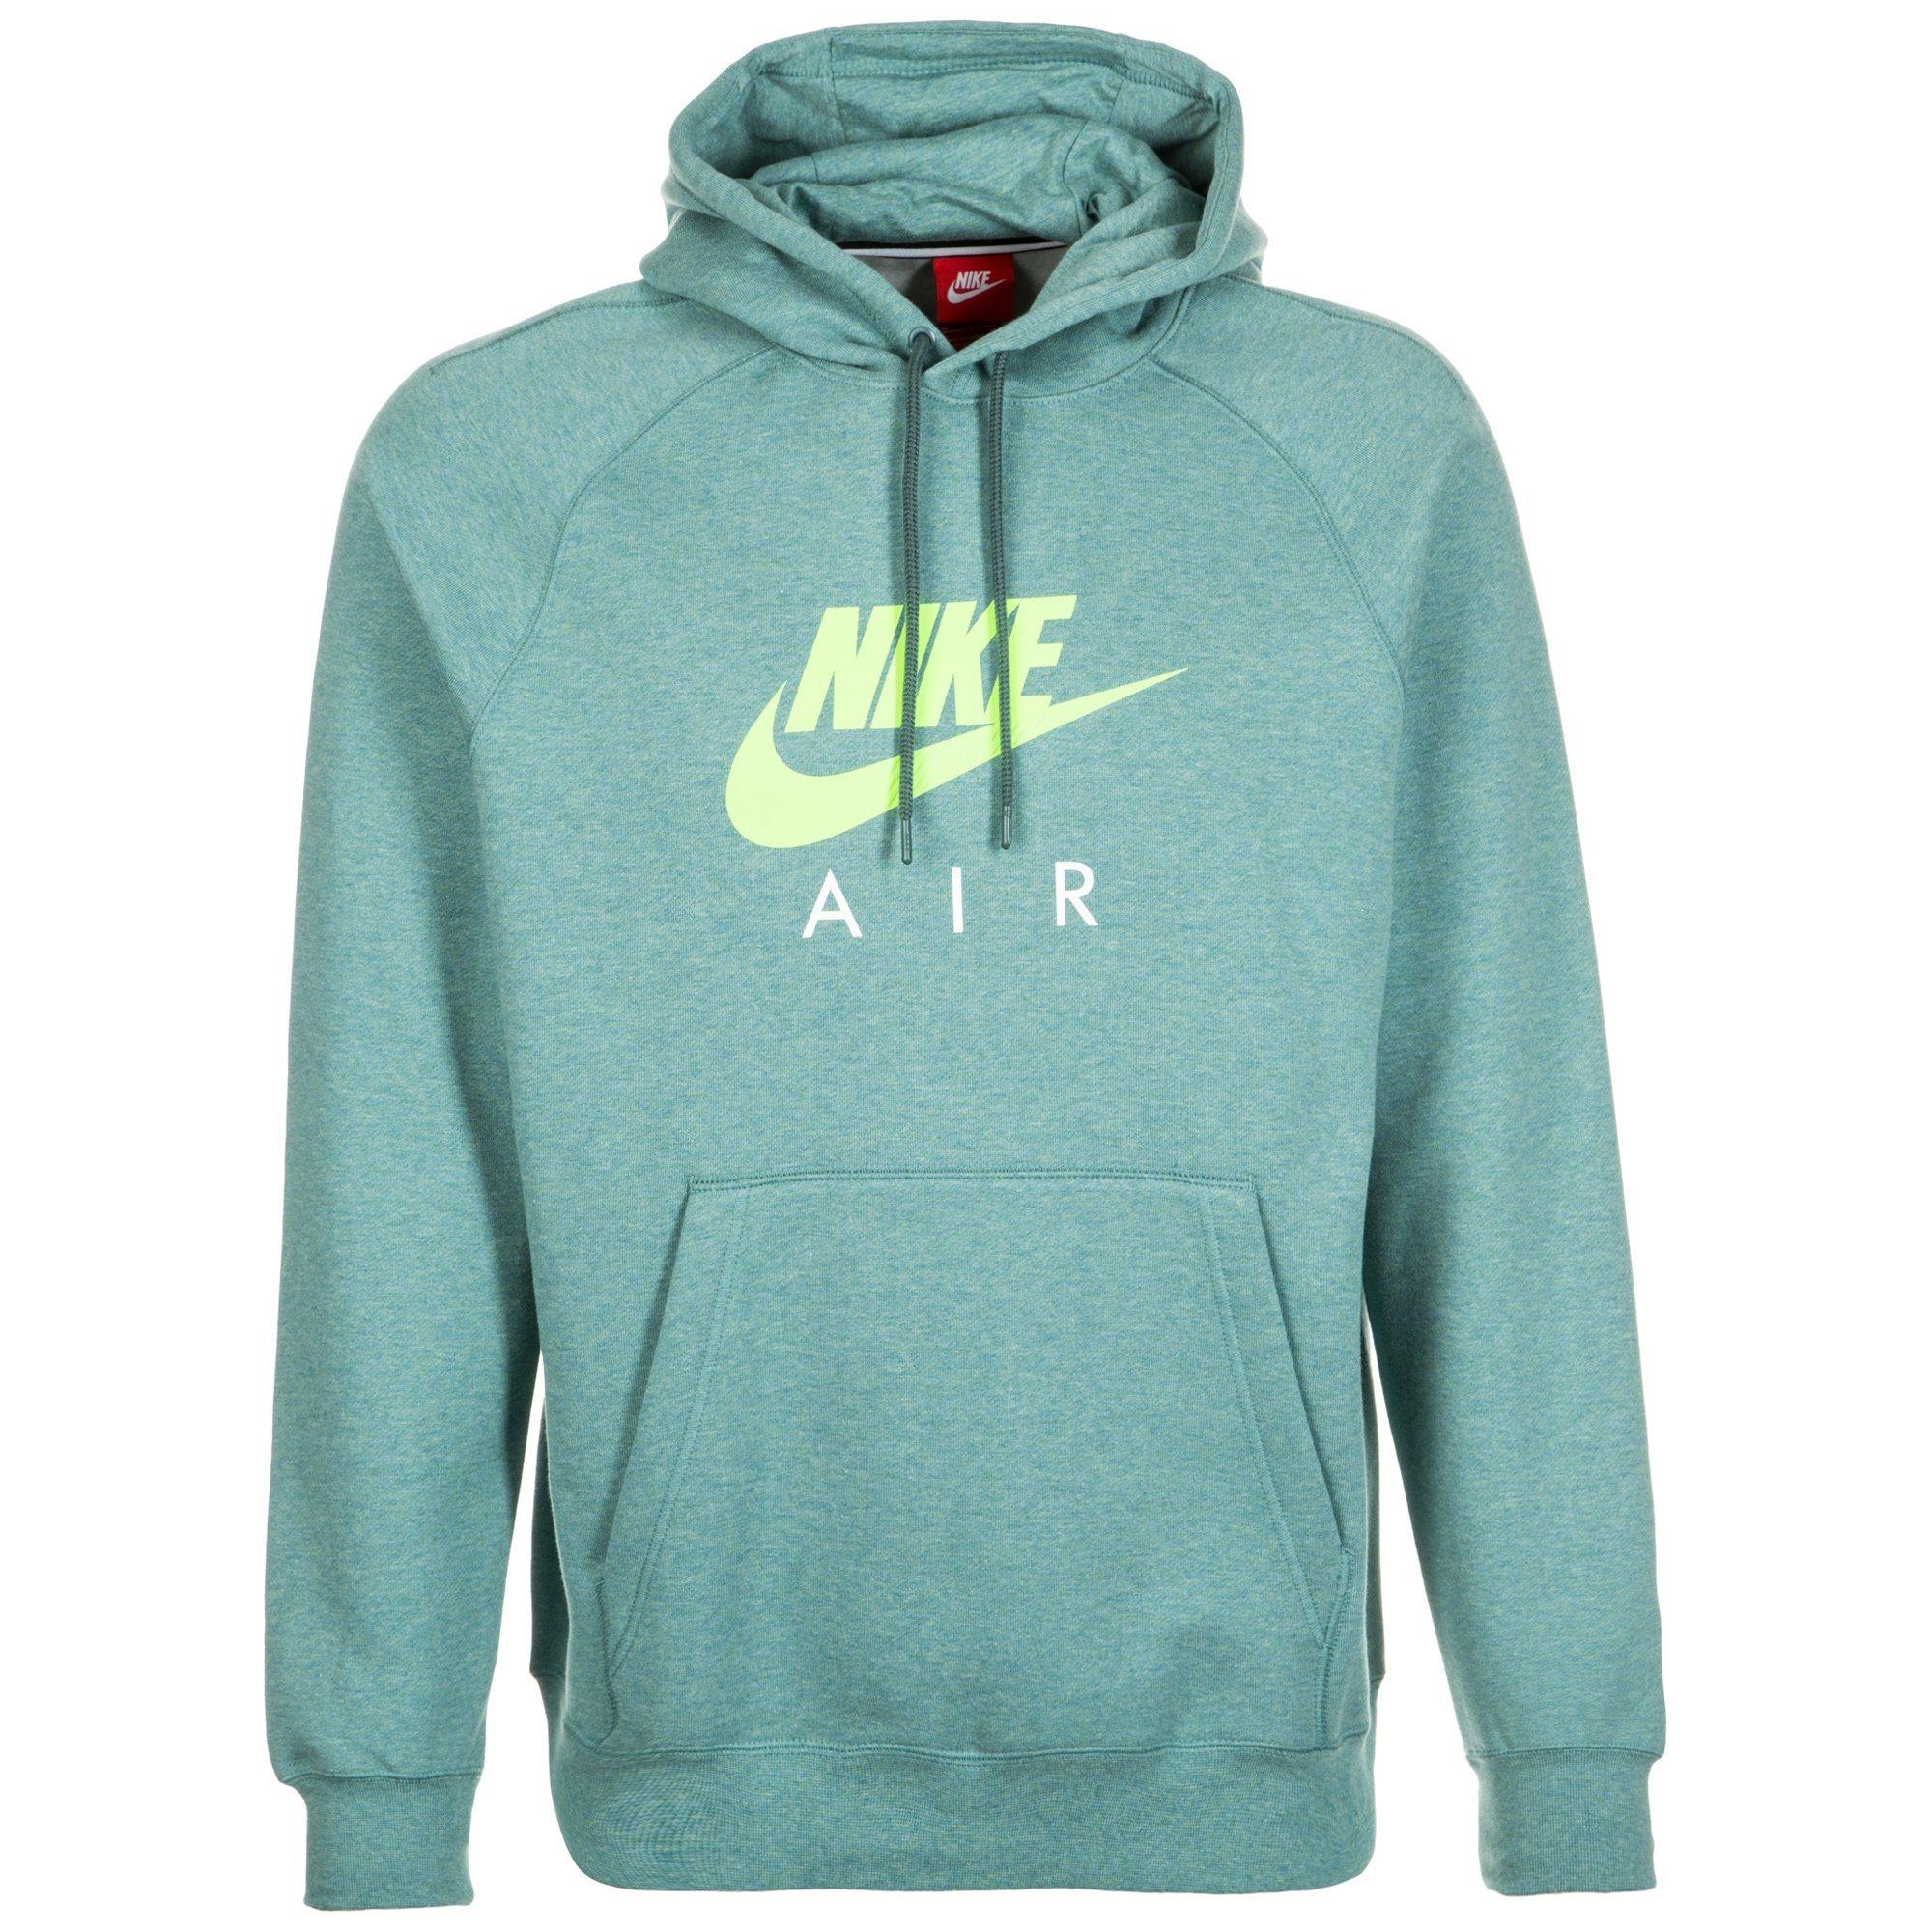 Nike Sportswear Air Fleece Kapuzenpullover Herren